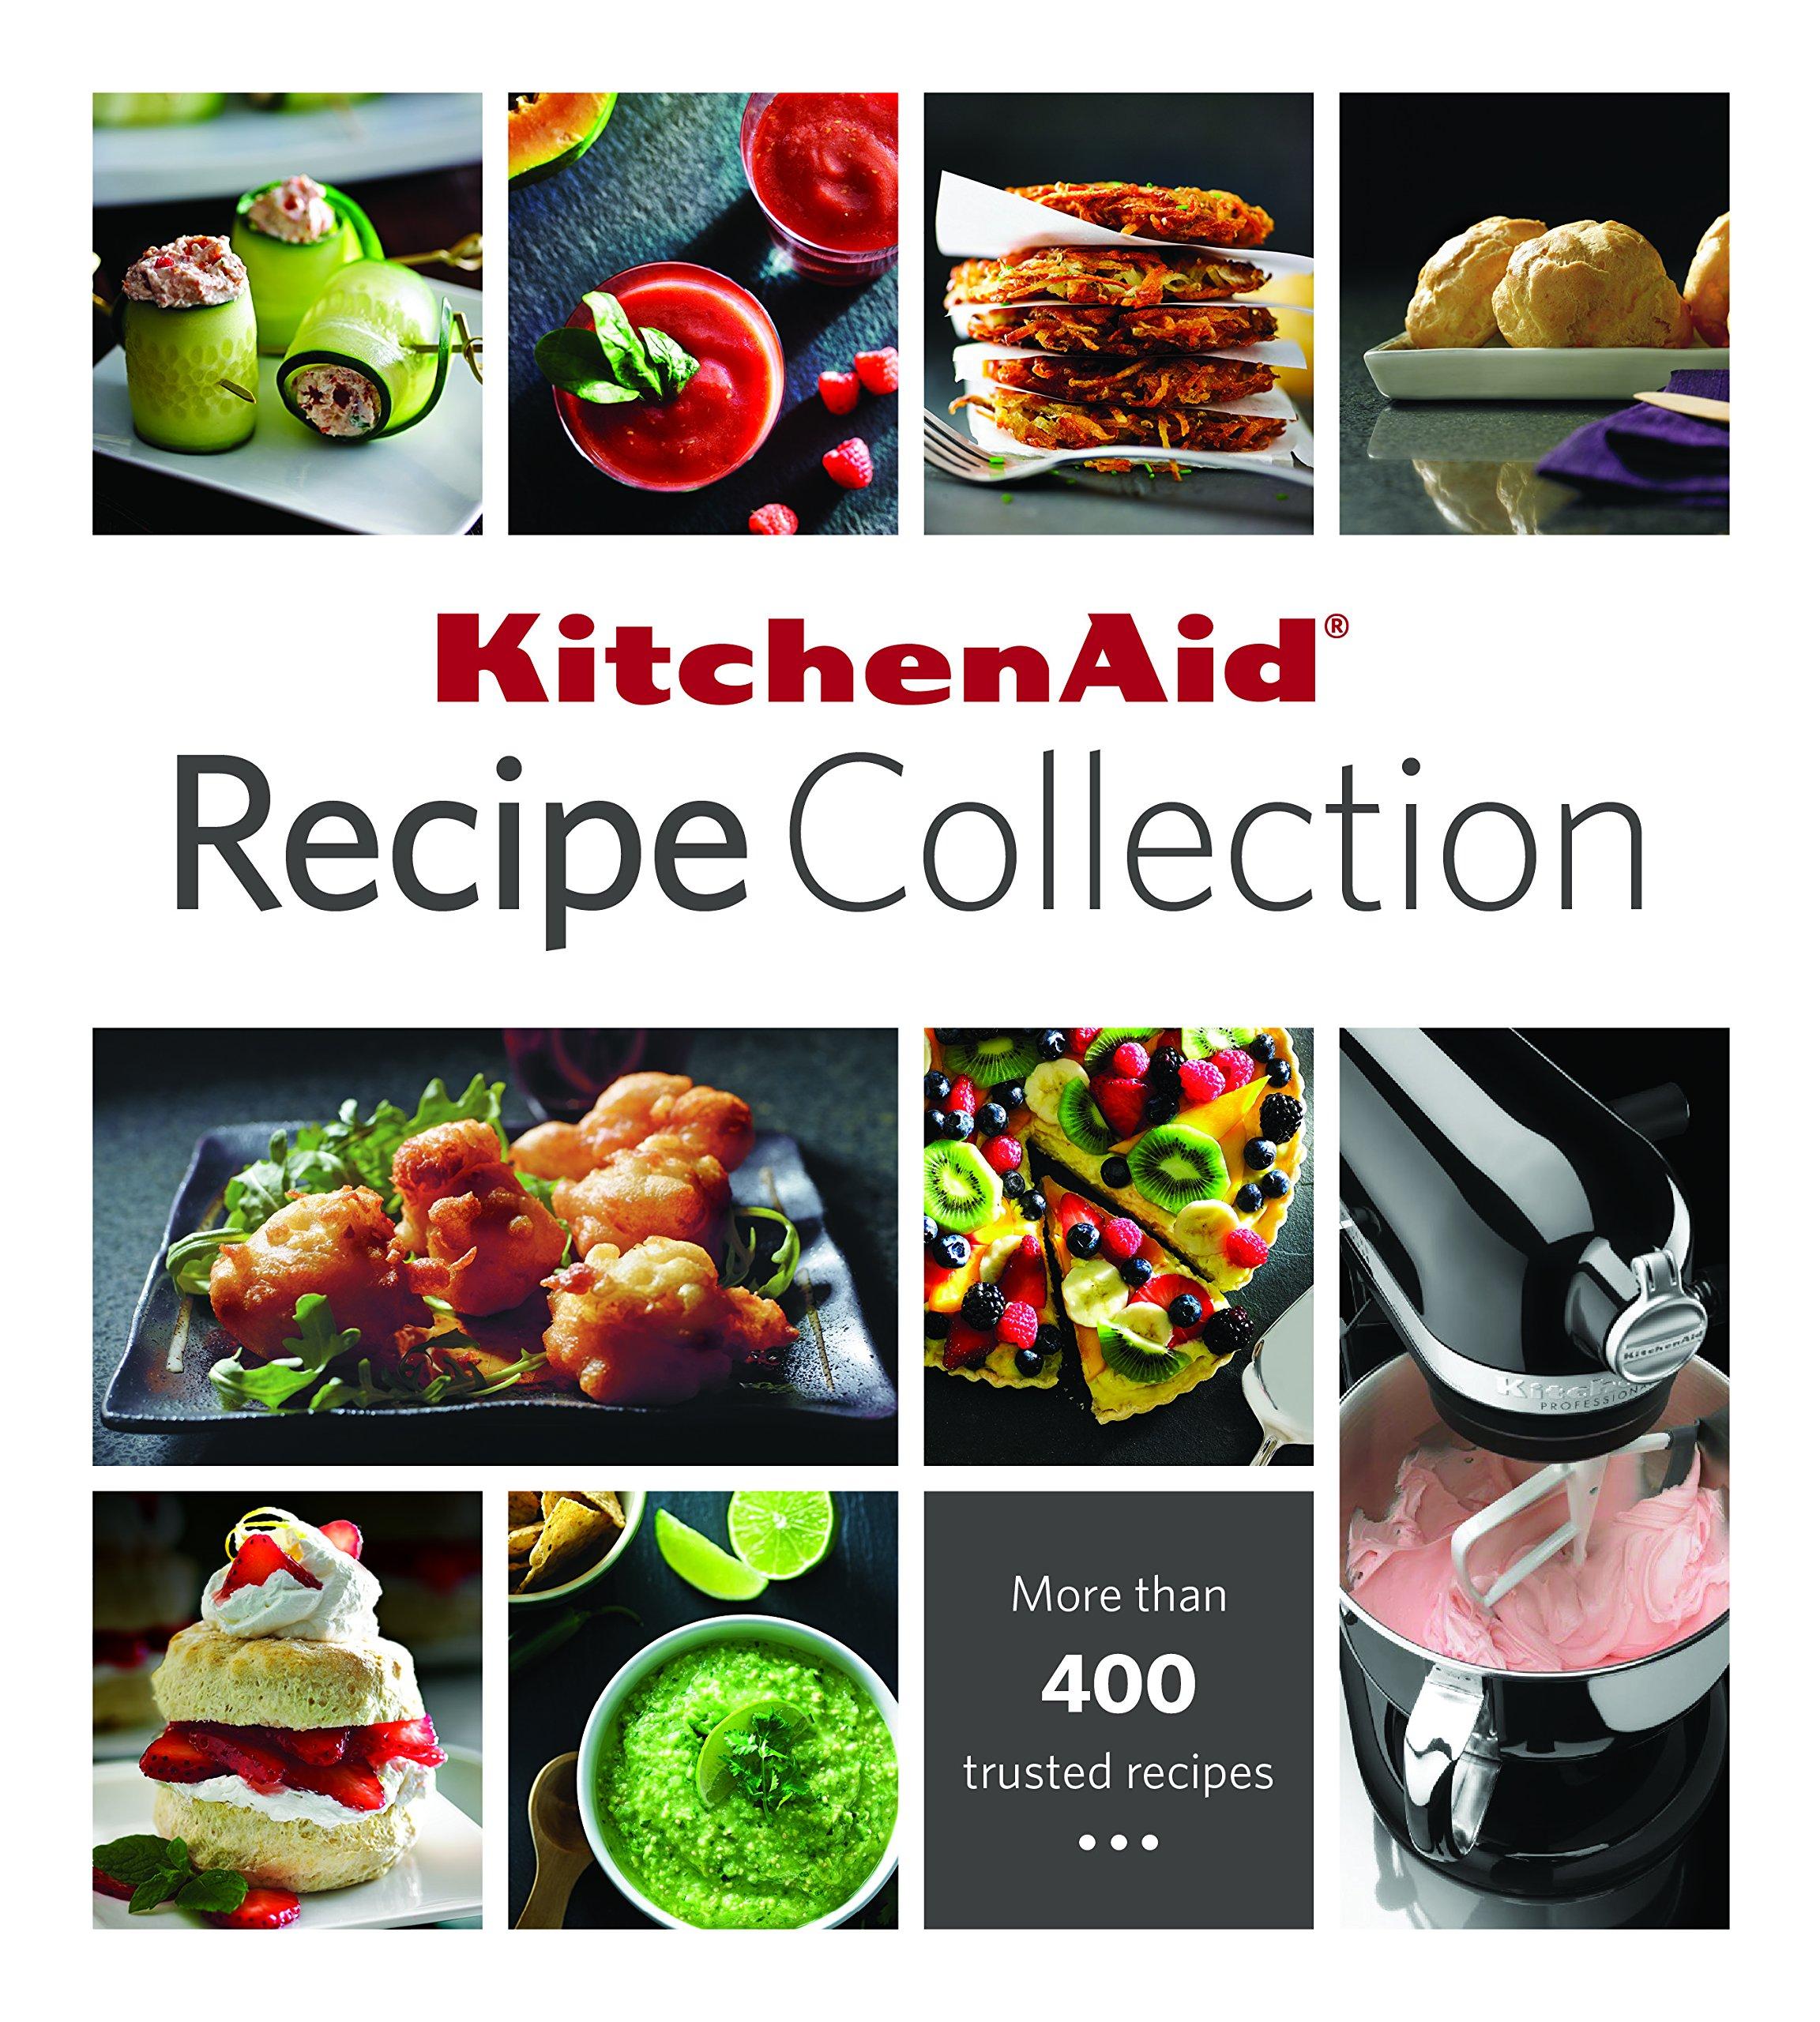 KitchenAid Collection Editors Publications International product image